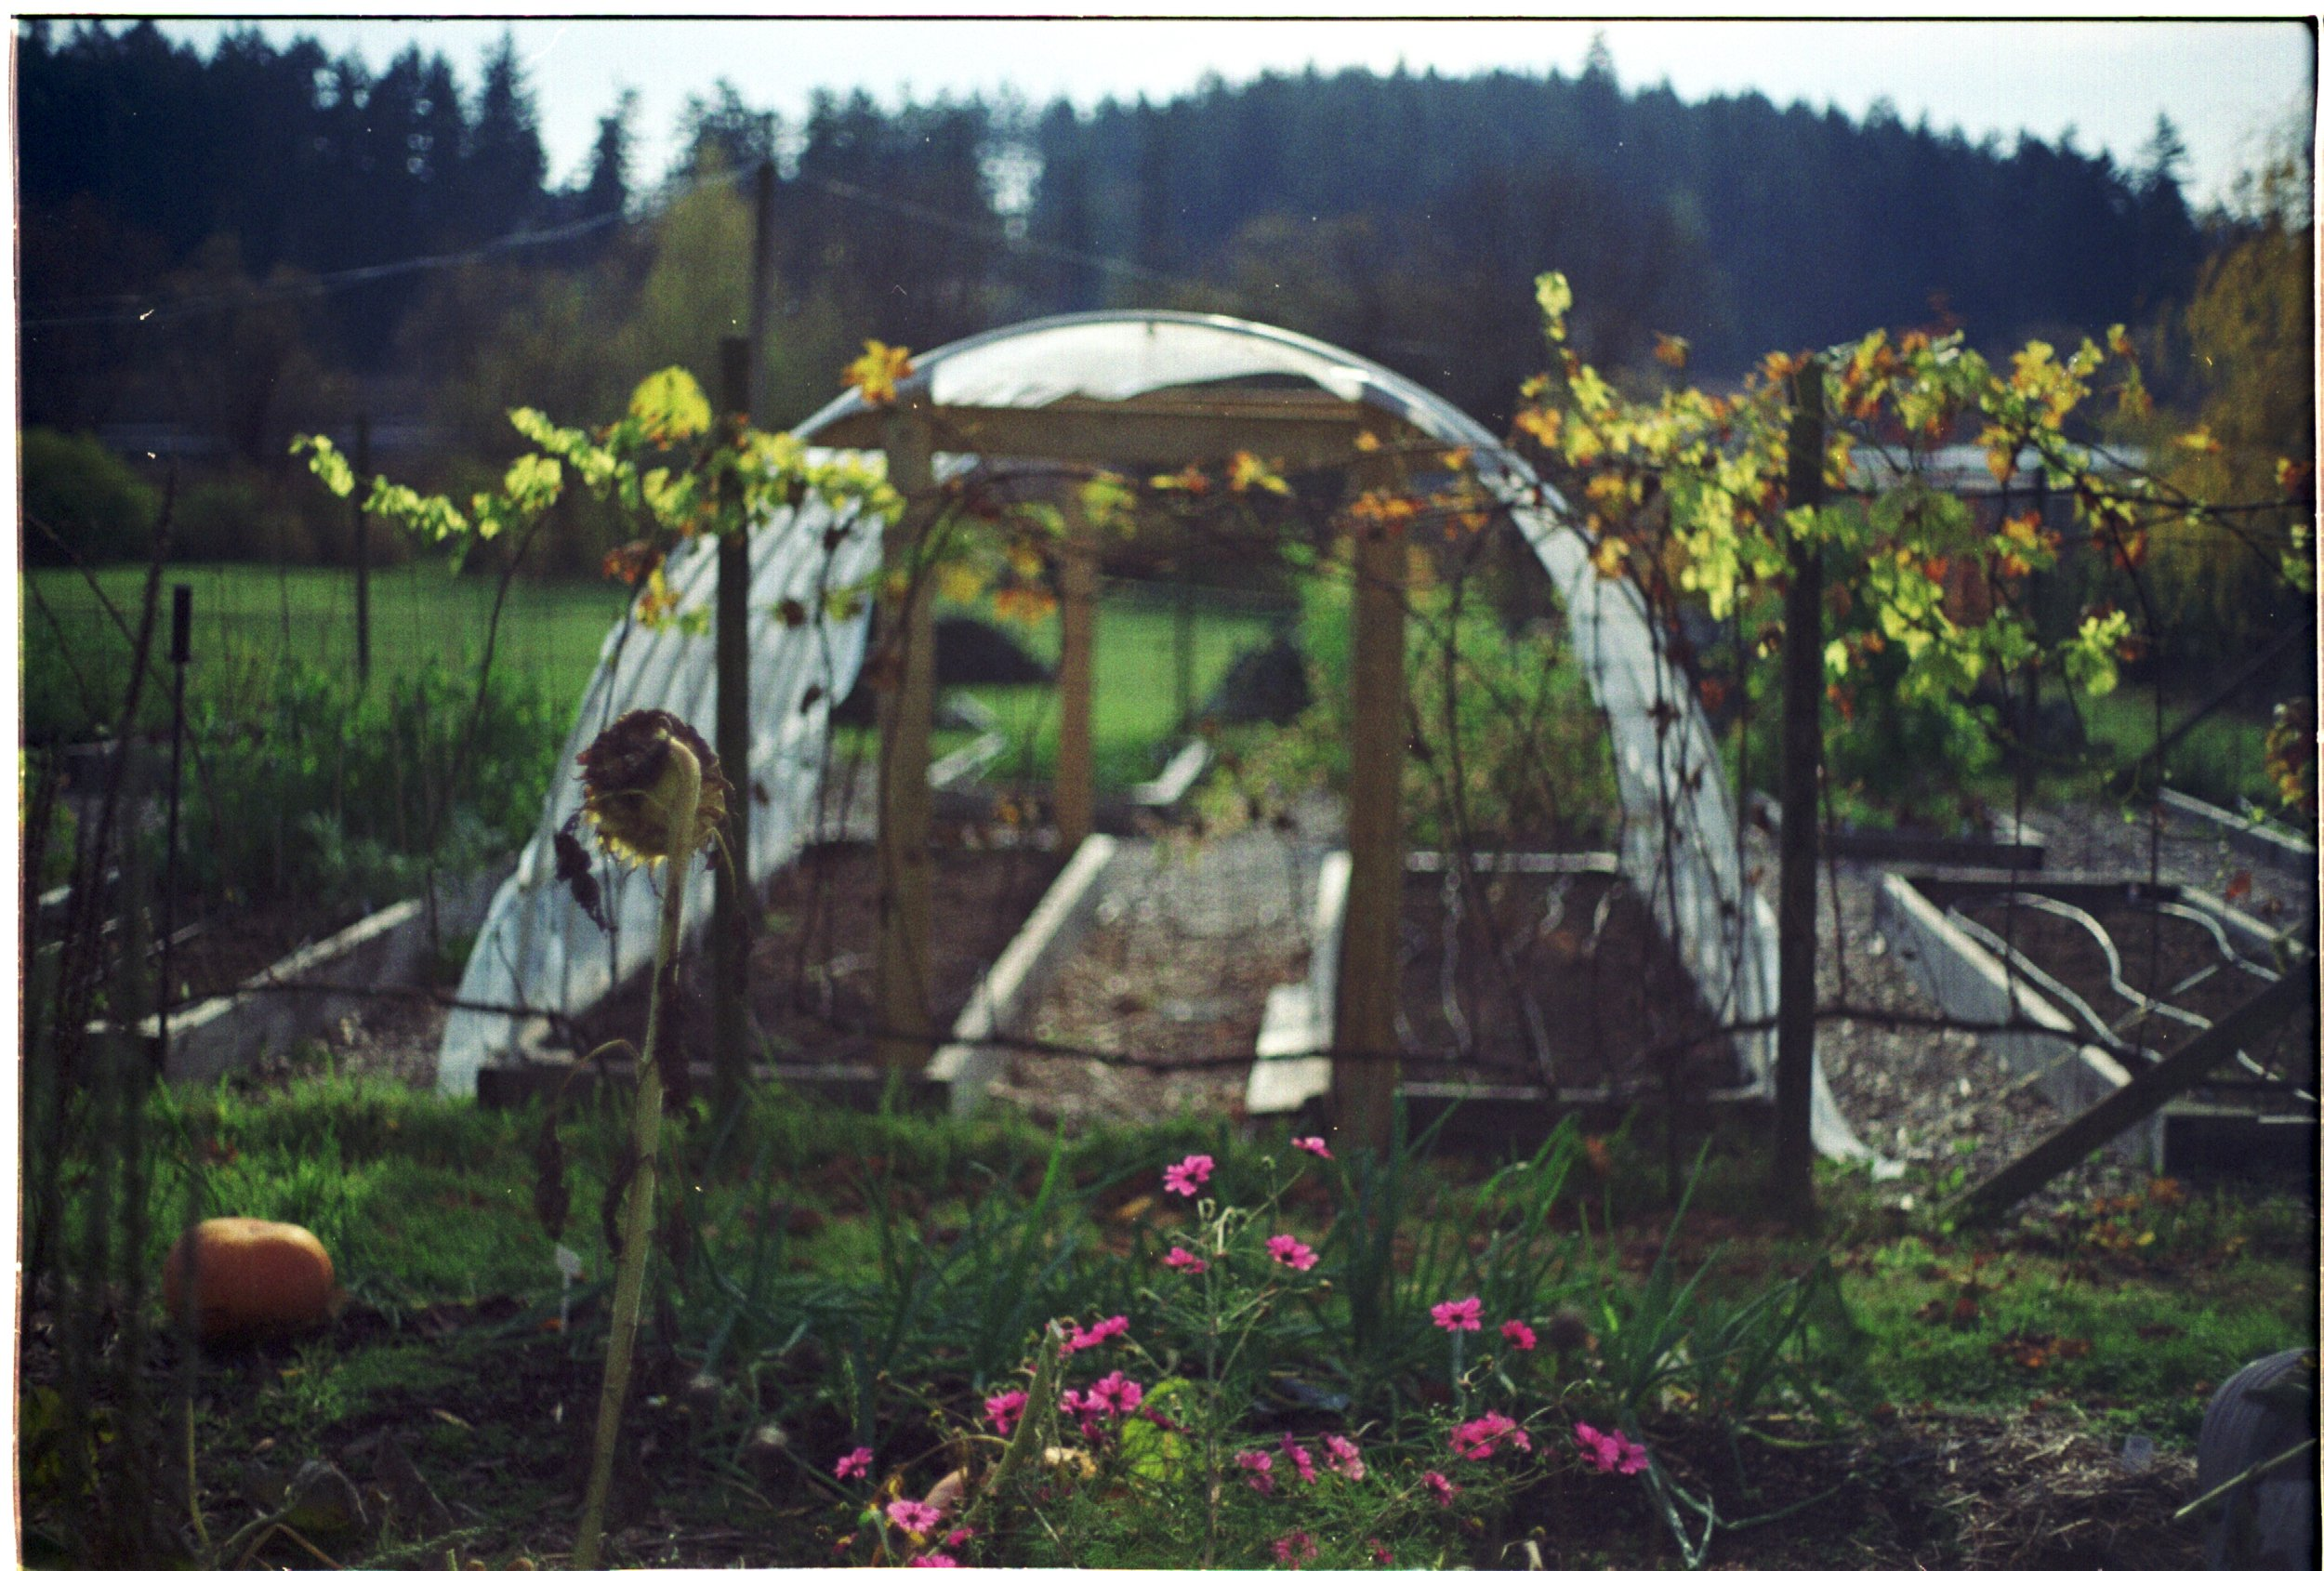 Hoophouse, Veggies, Gardens, Victoria, BC